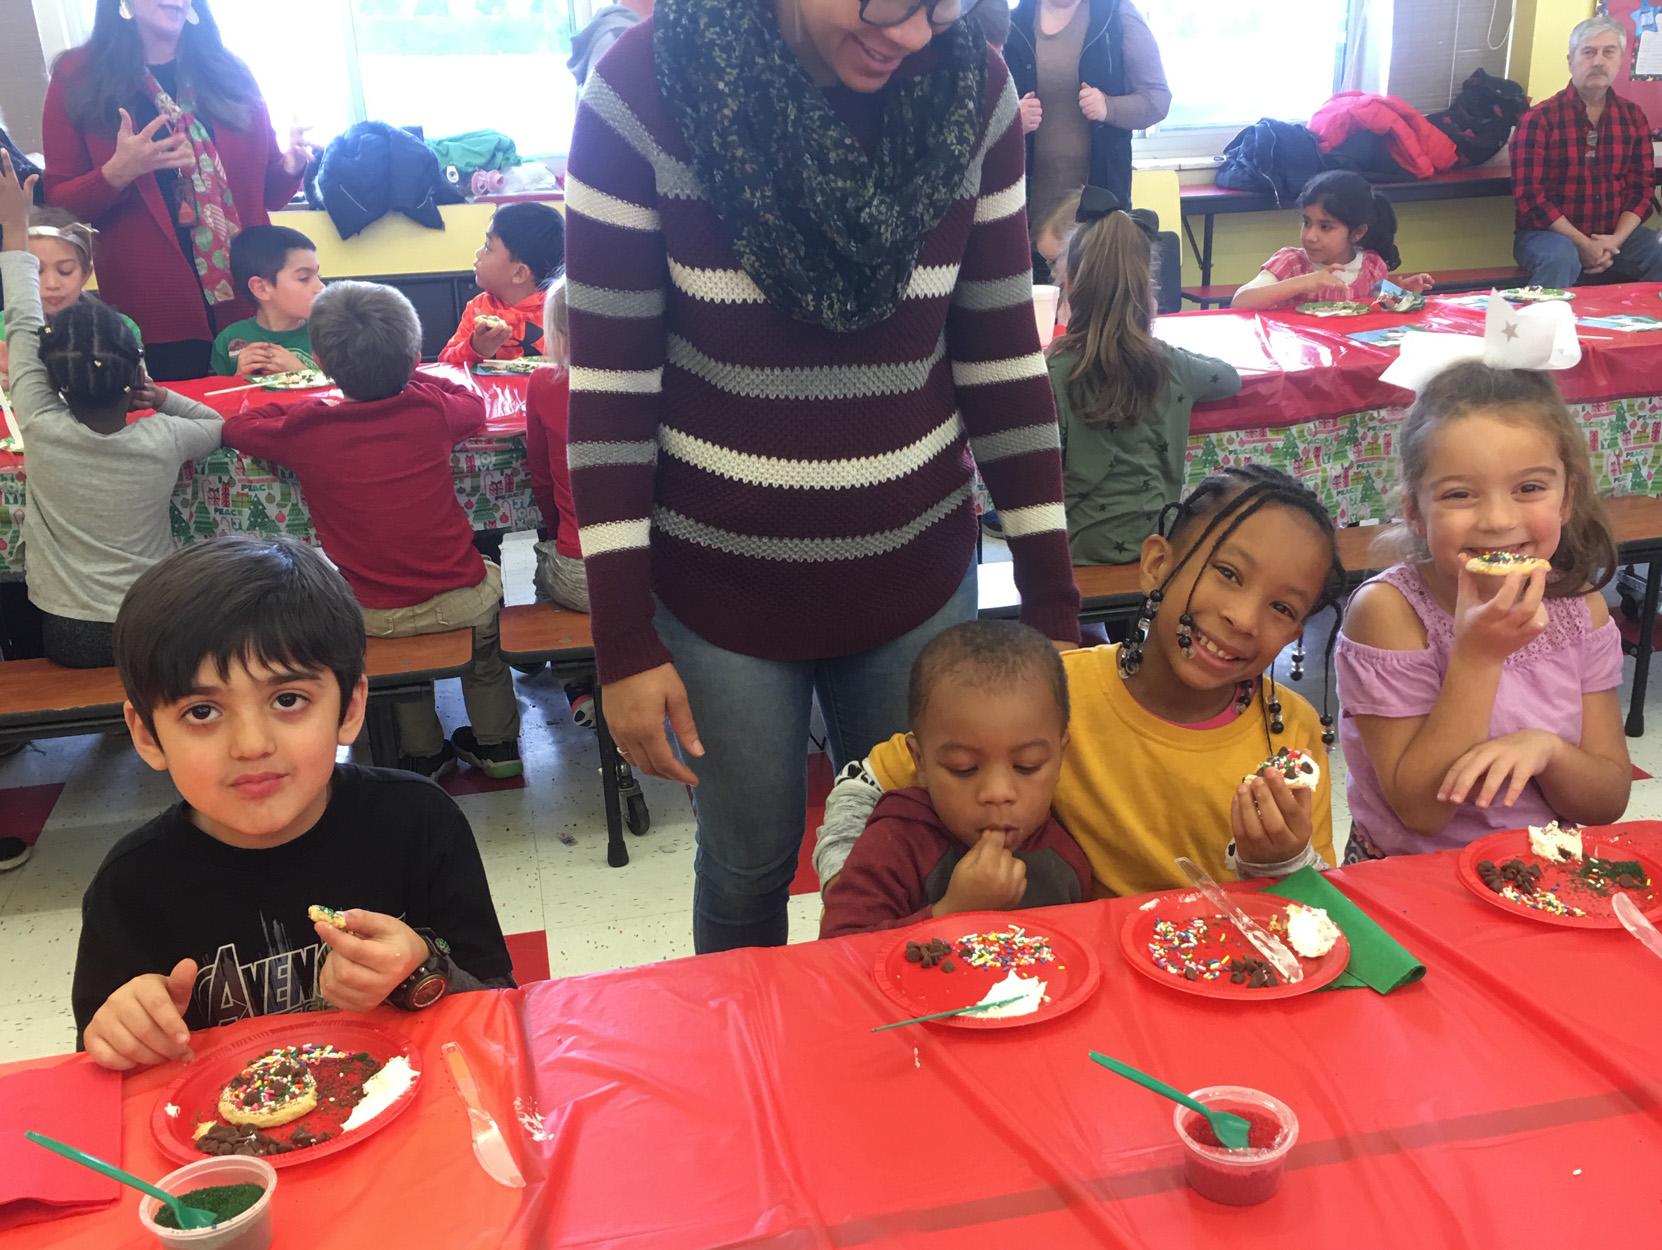 children enjoy eating cookies together